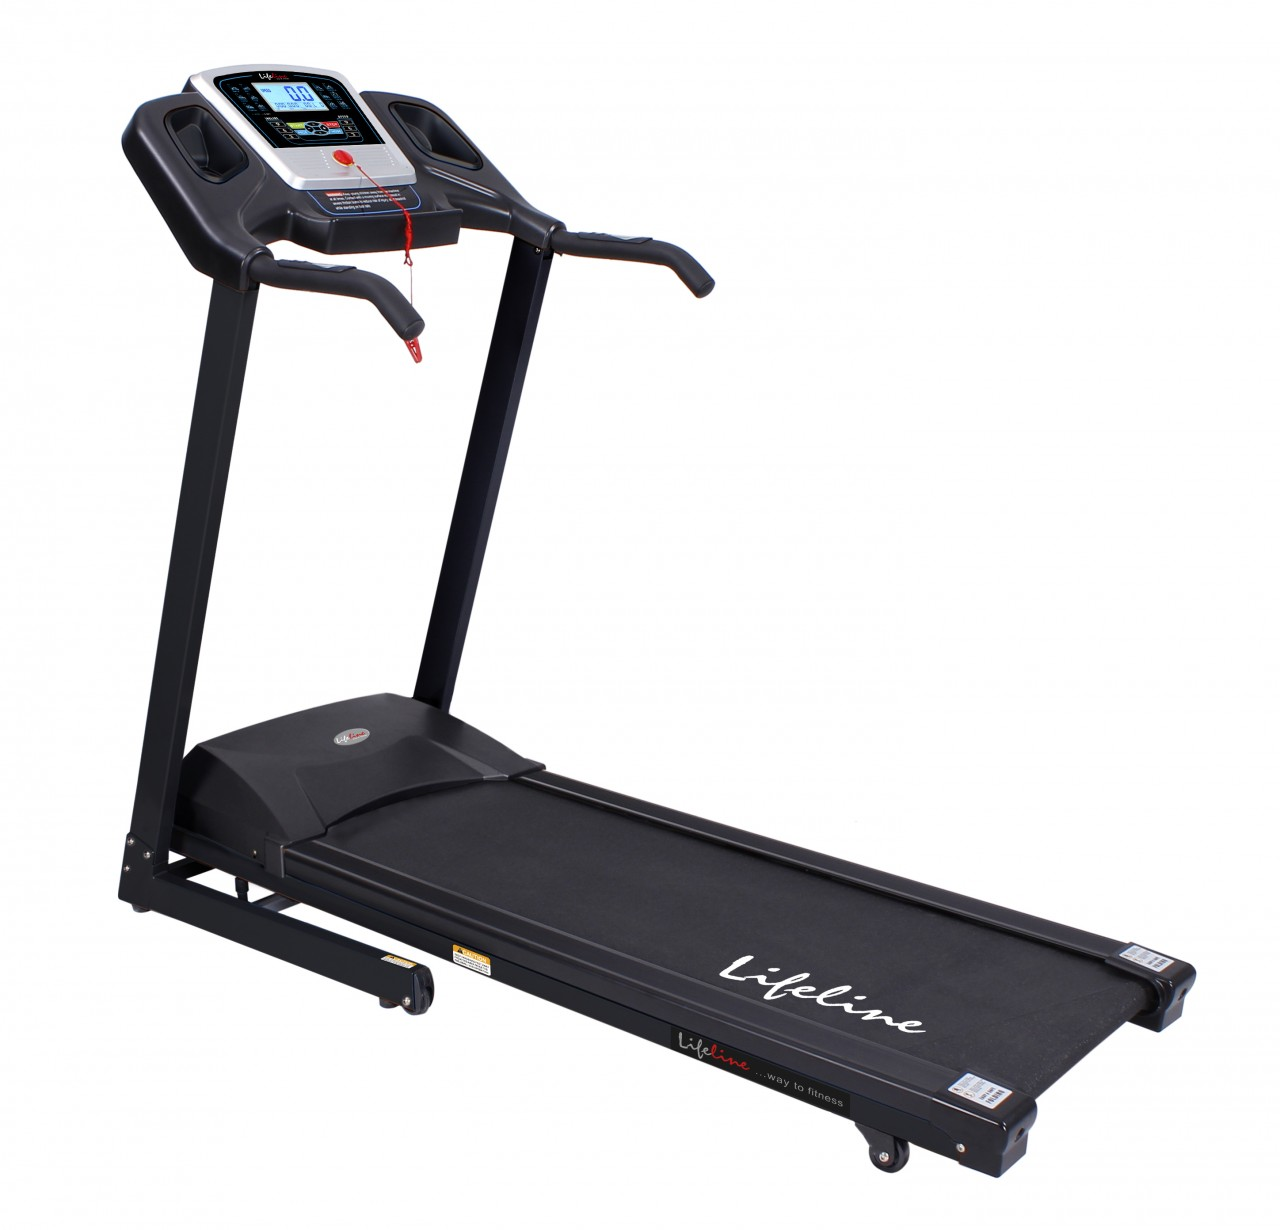 Shop lifeline motorized treadmill venice 4 2b 2 5 hp cont for Treadmill 2 5 hp motor